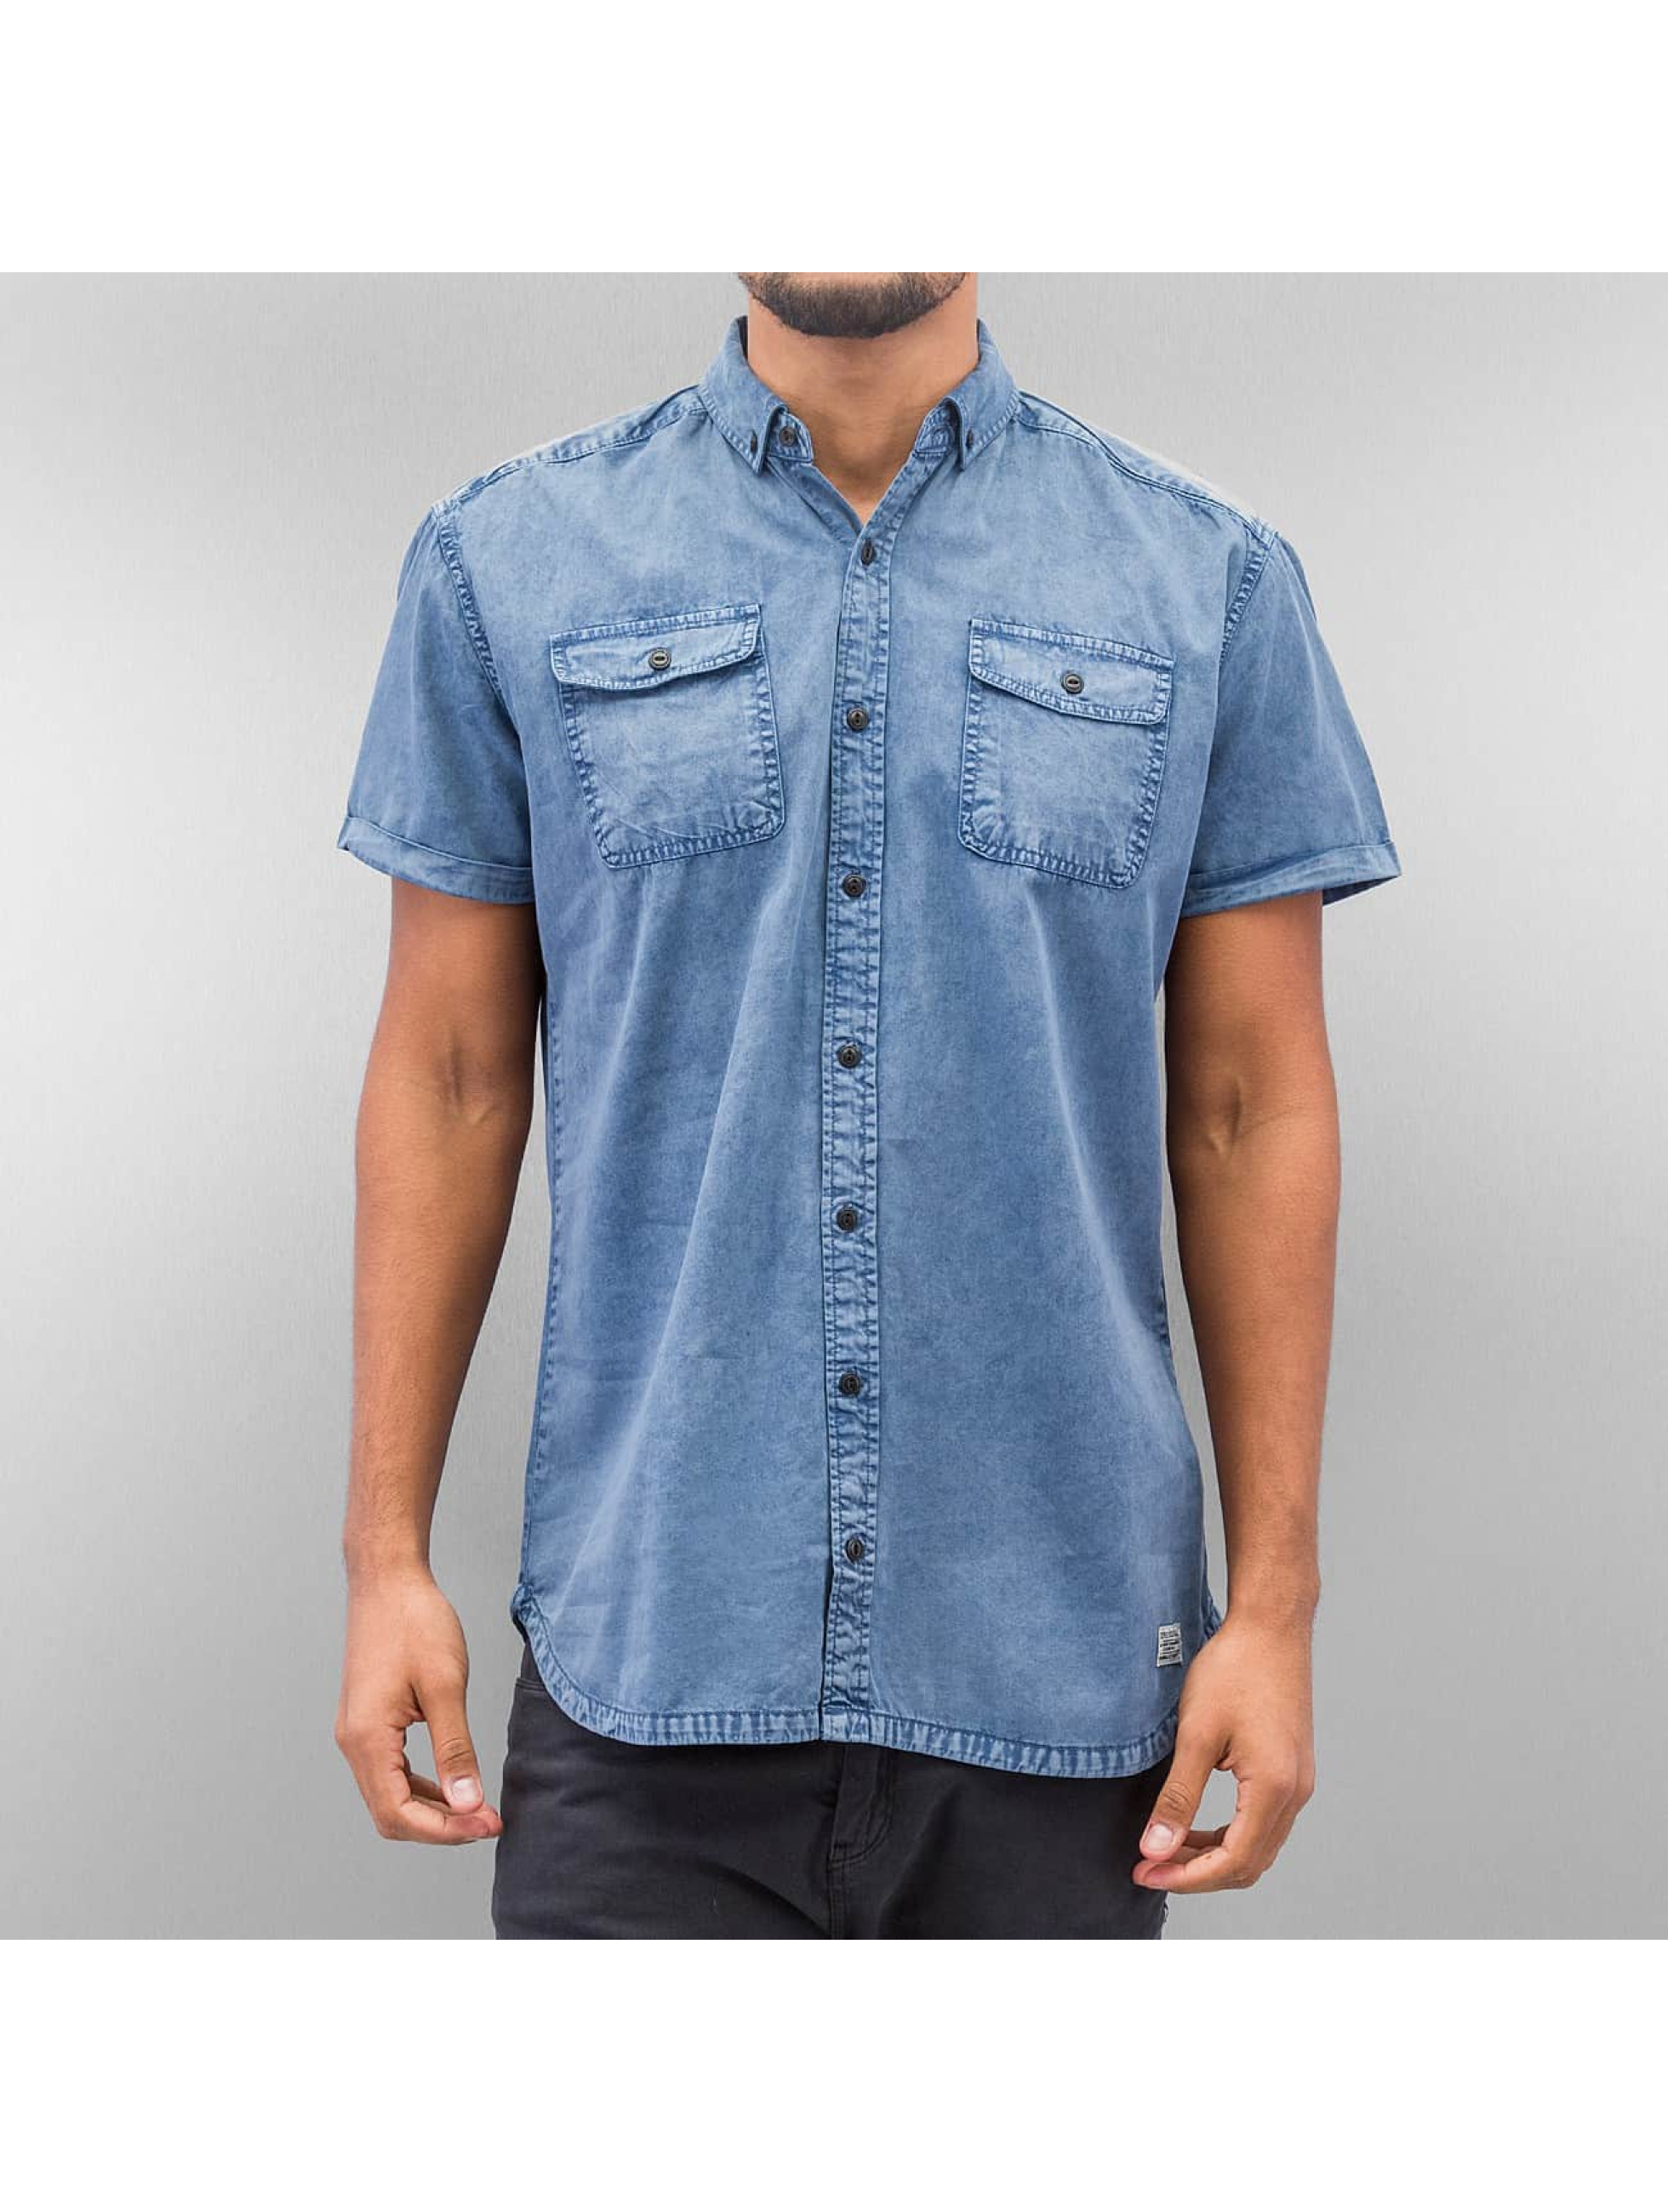 SHINE Original Hemd Washed And Worn Out blau